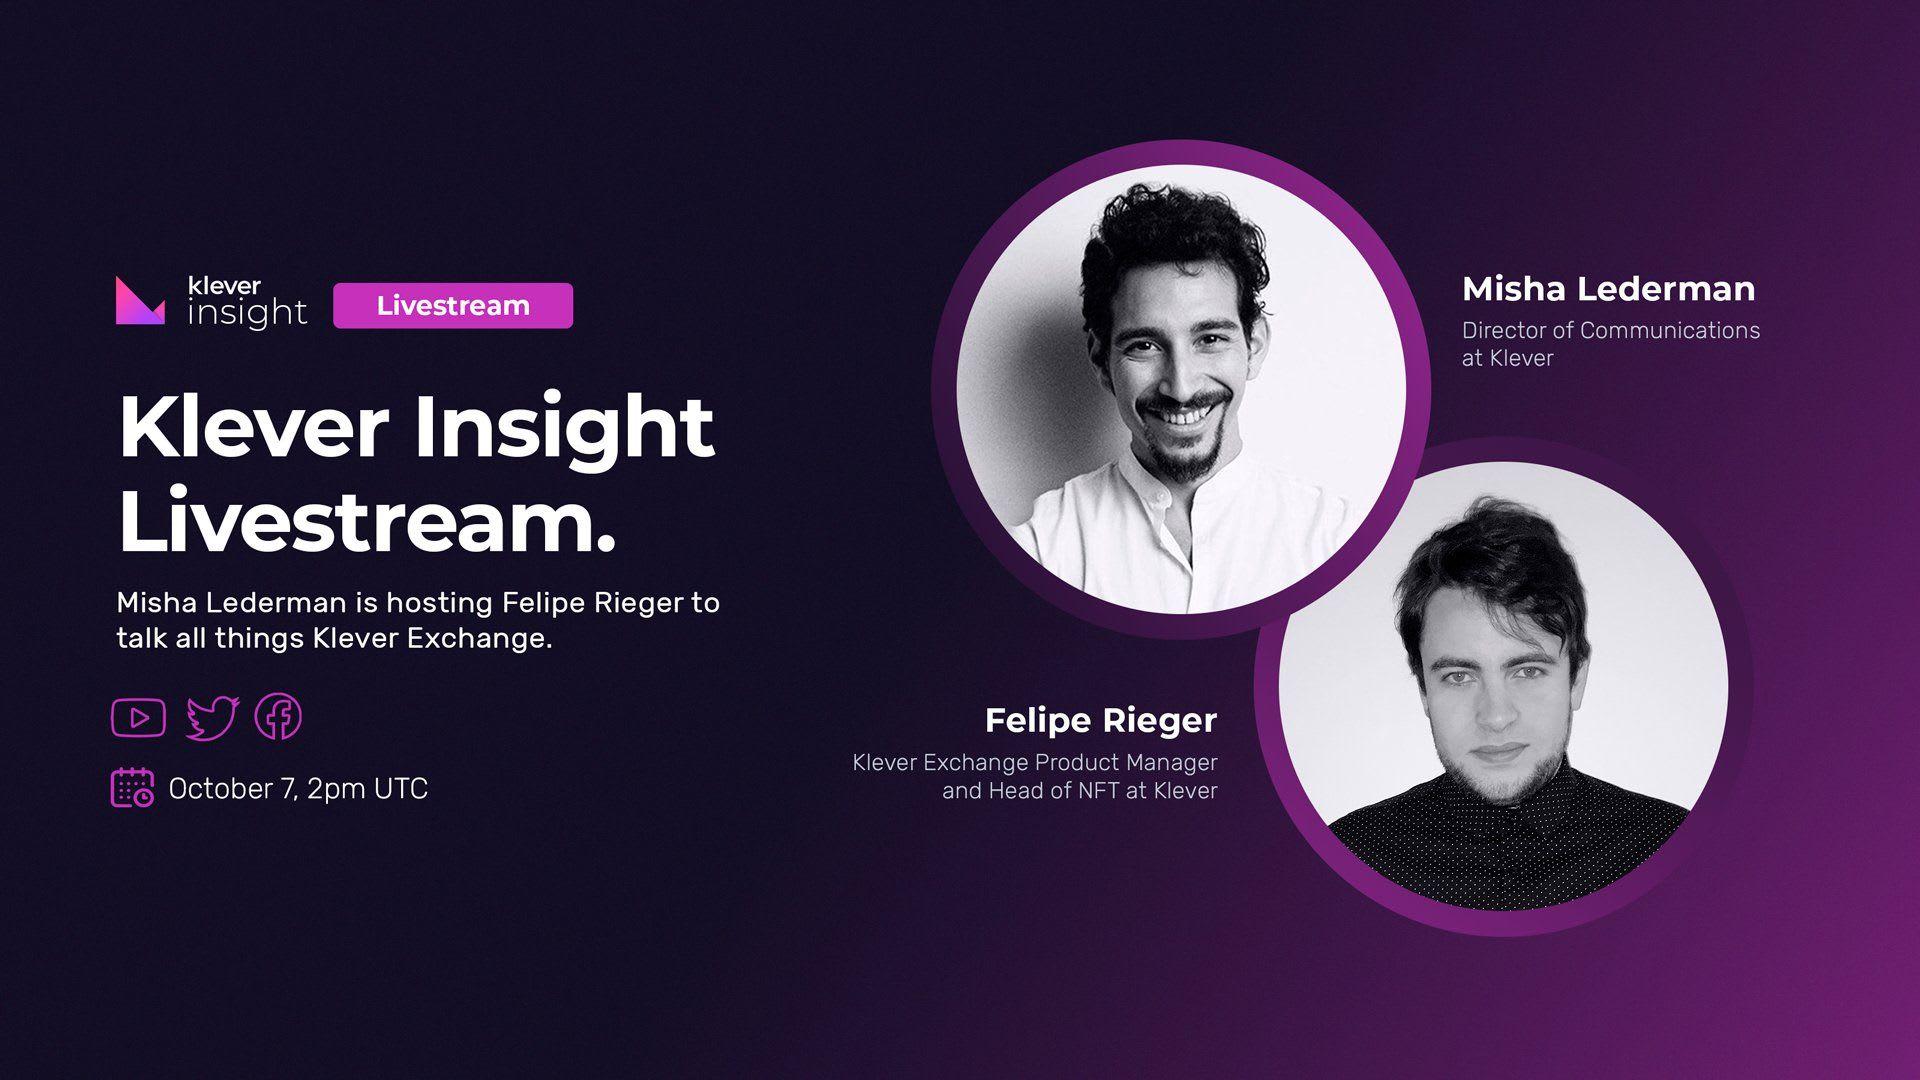 Livestream: Explore all things Klever Exchange with  Misha Lederman & Felipe Rieger